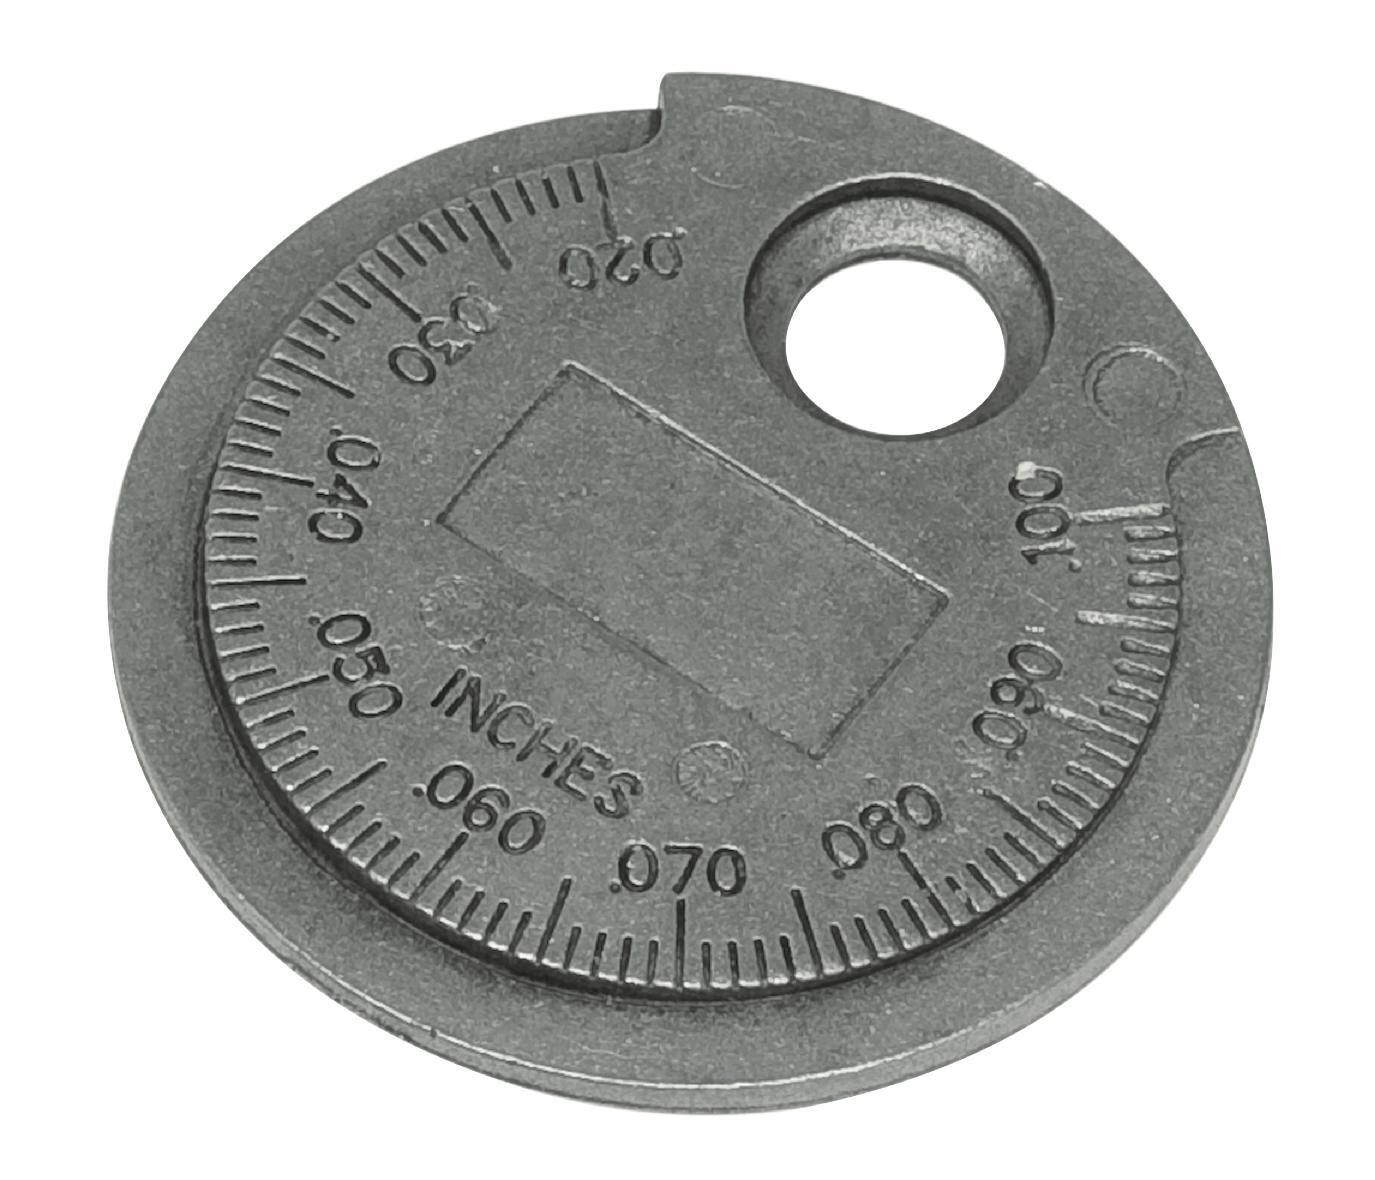 LS67870 - Spark Plug Gauge